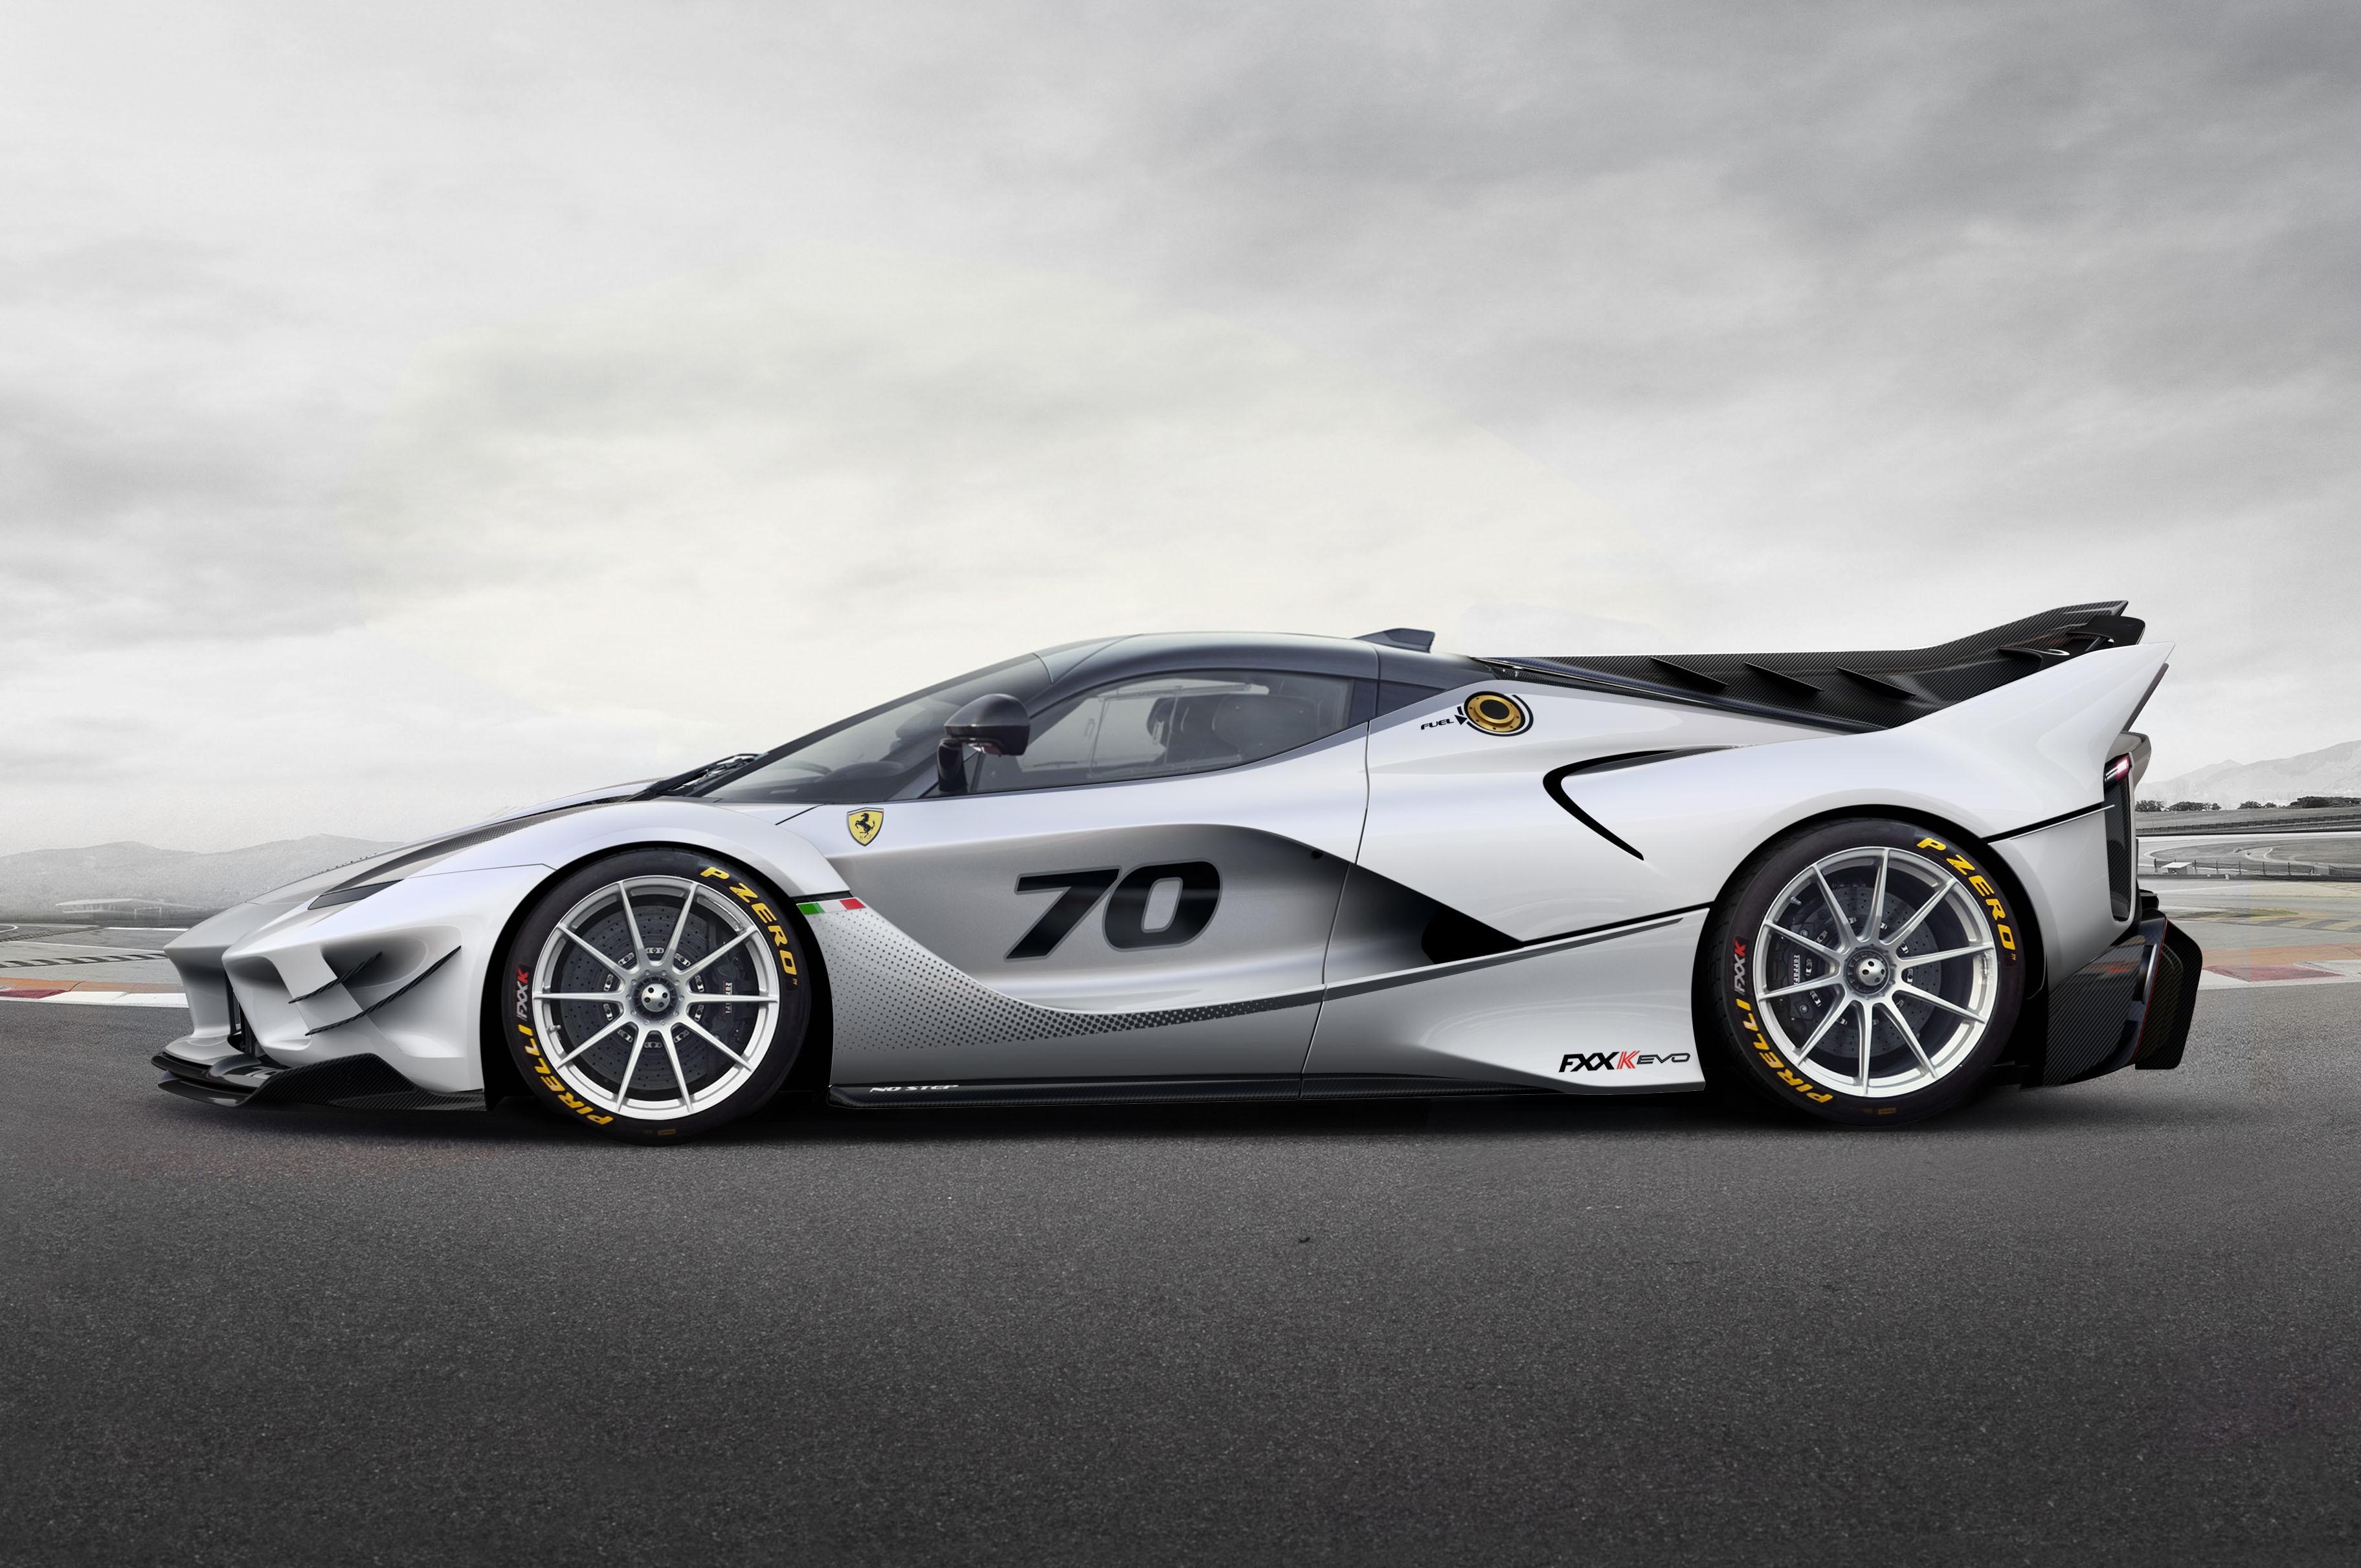 Ferrari Fxx K Evo Is Lighter More Aerodynamic Than Predecessor